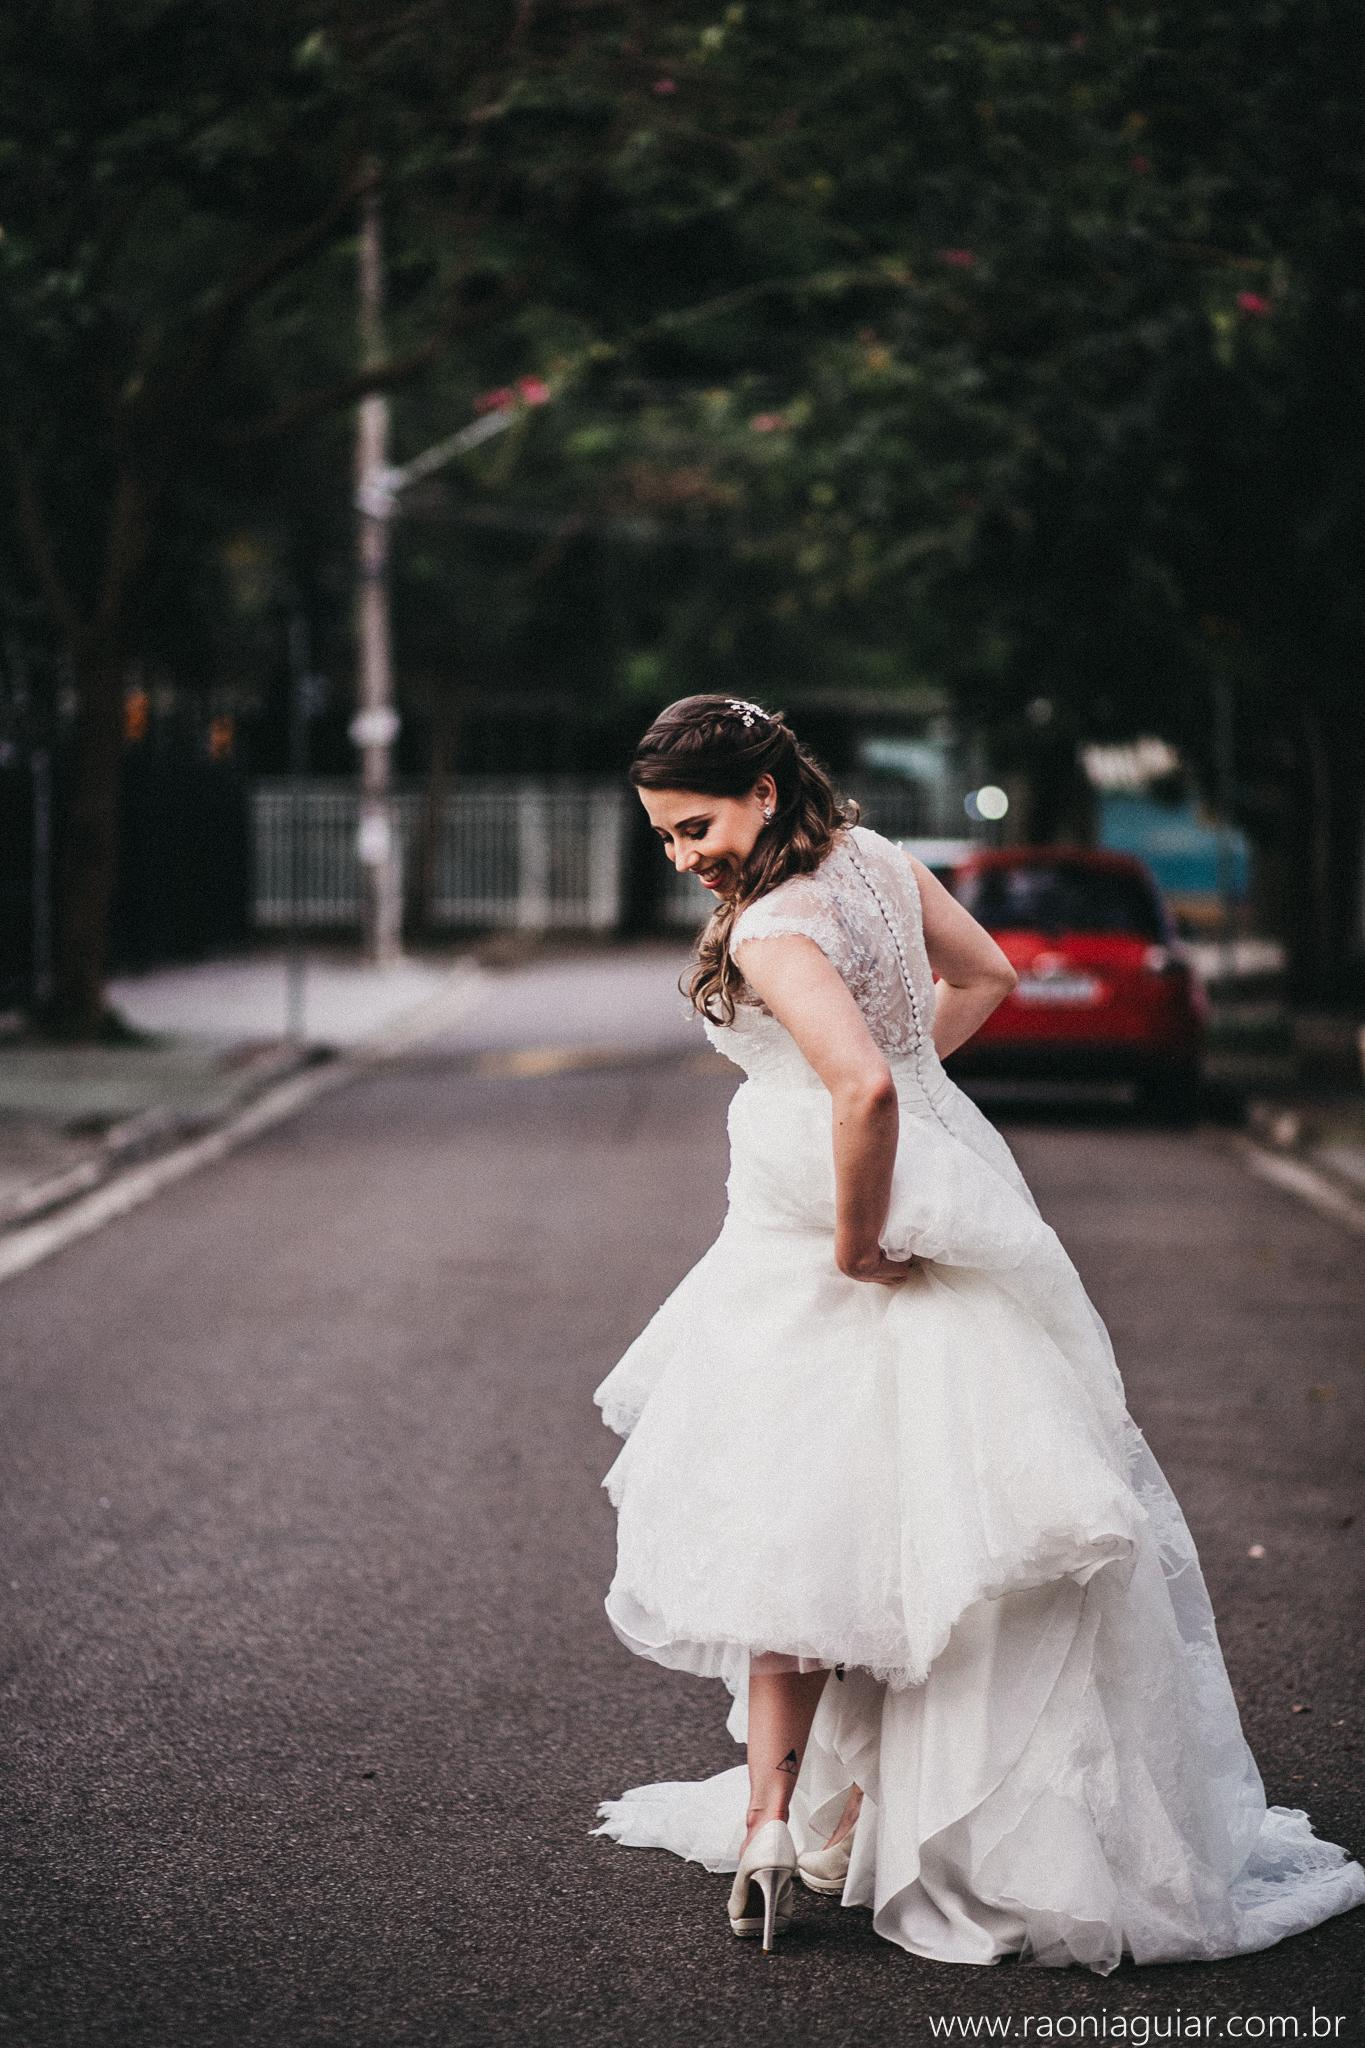 2018.10 Casamento Rebeca Soares e Felipe 0089.jpg